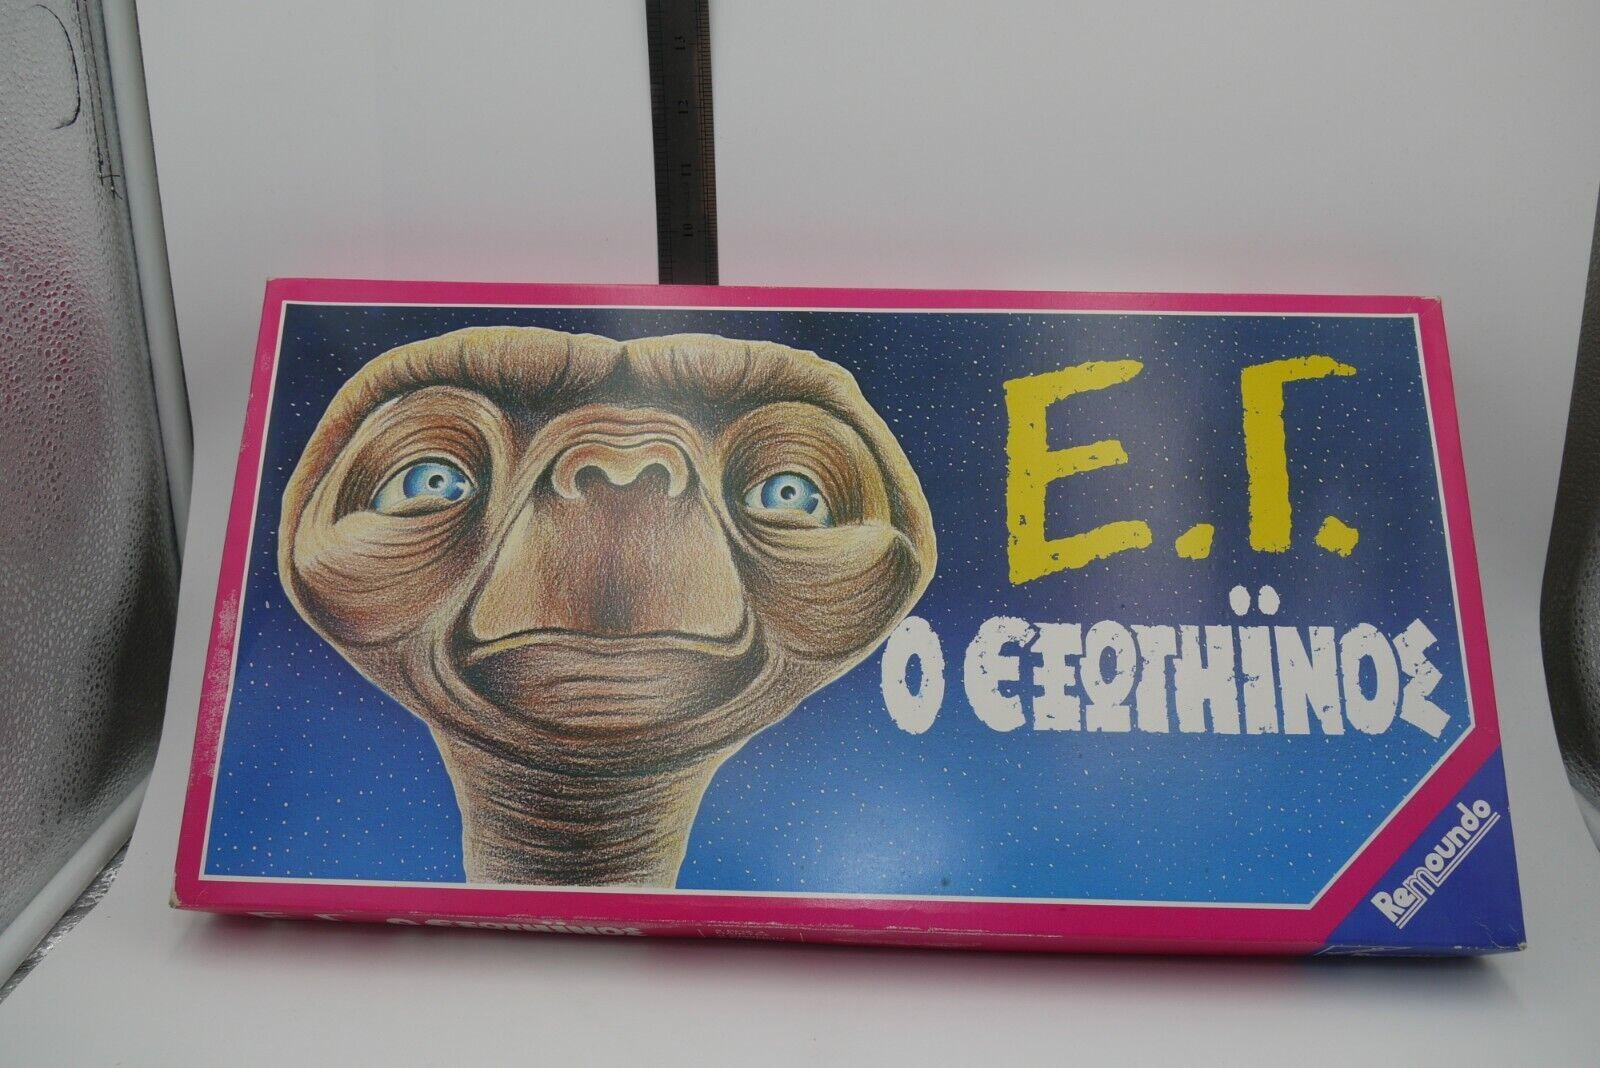 Vintage années 80 E.T l'extraterrestre grec Board Game remoundo non perforé